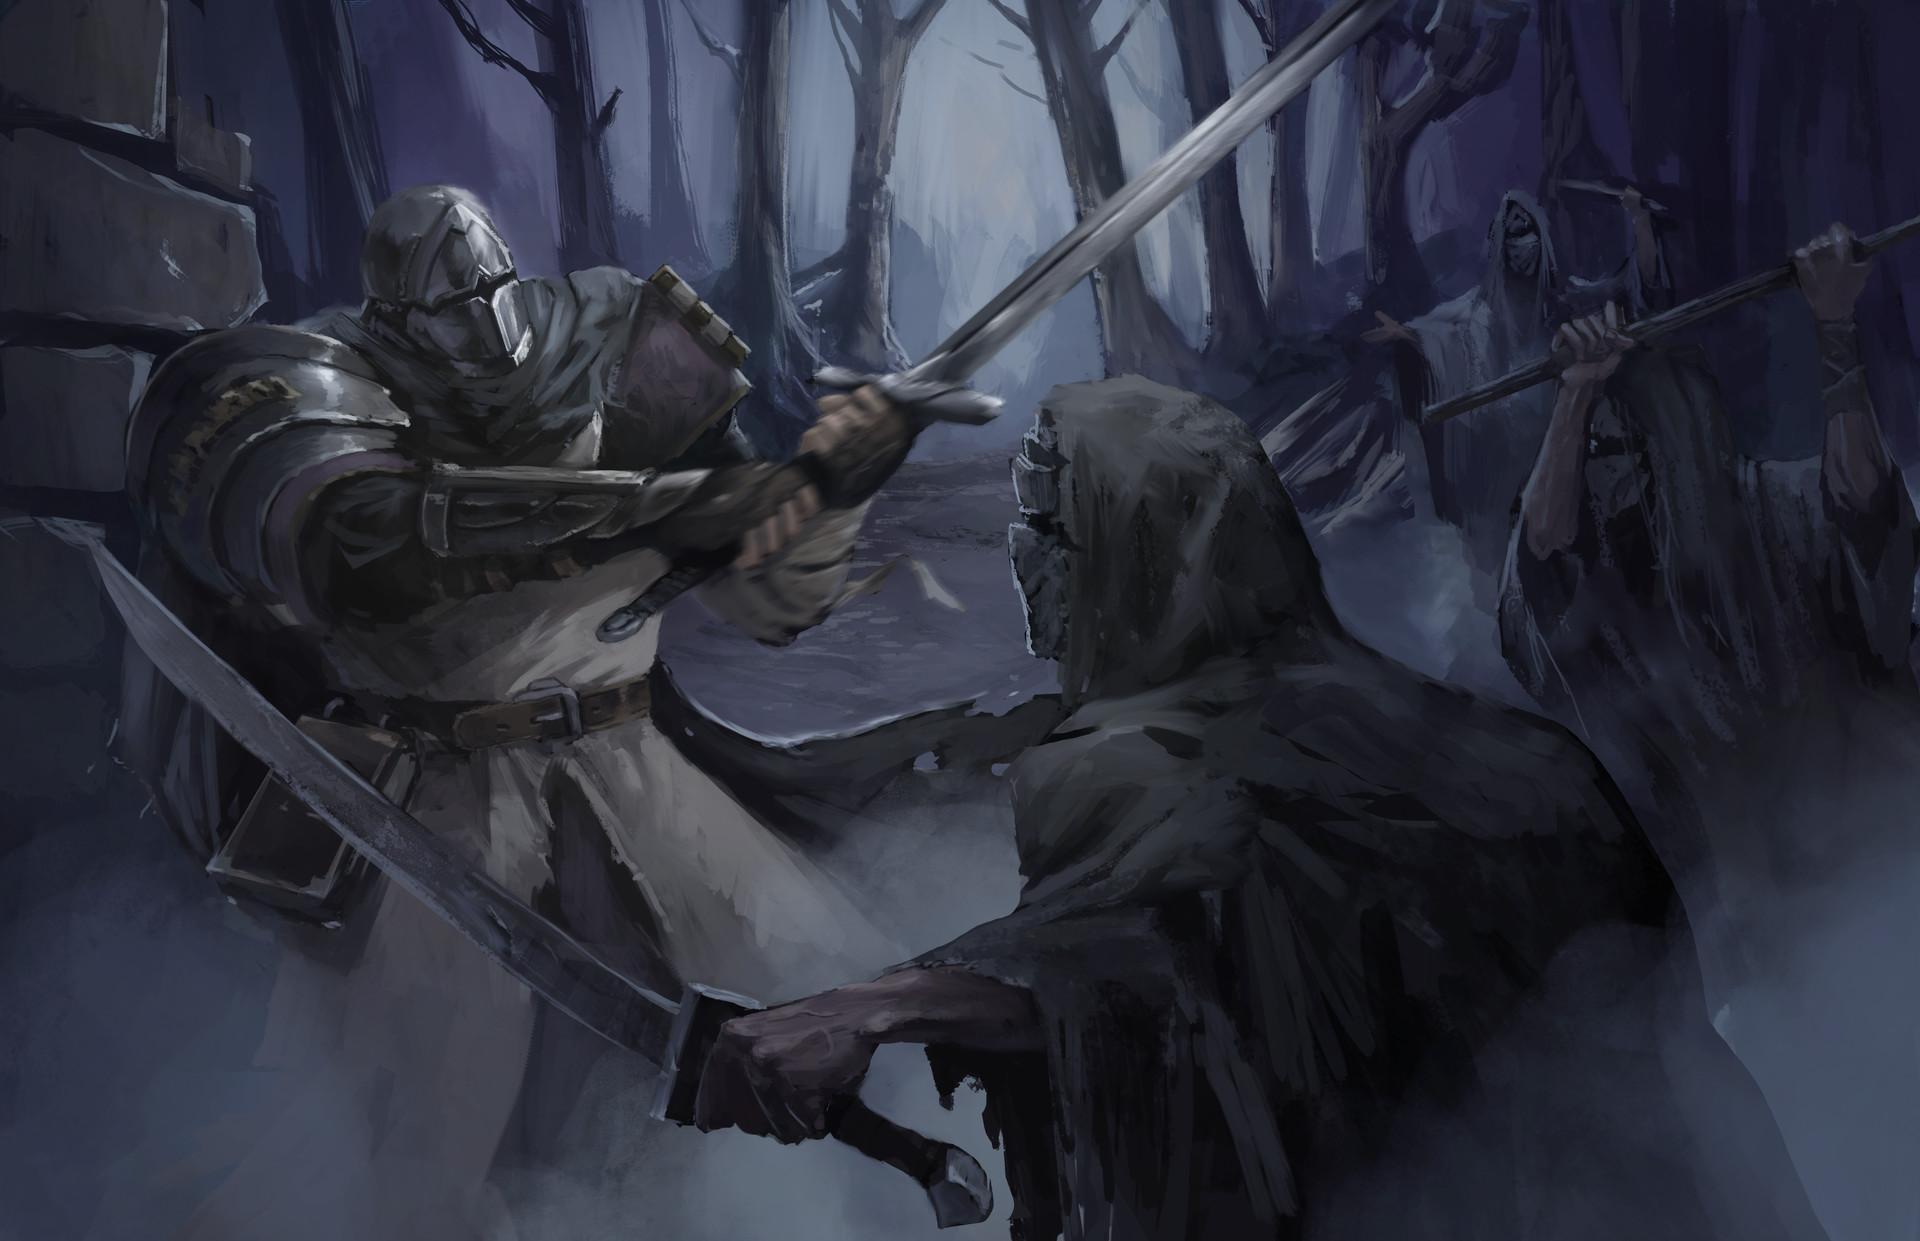 Sergio roman ilustracion dark souls faith